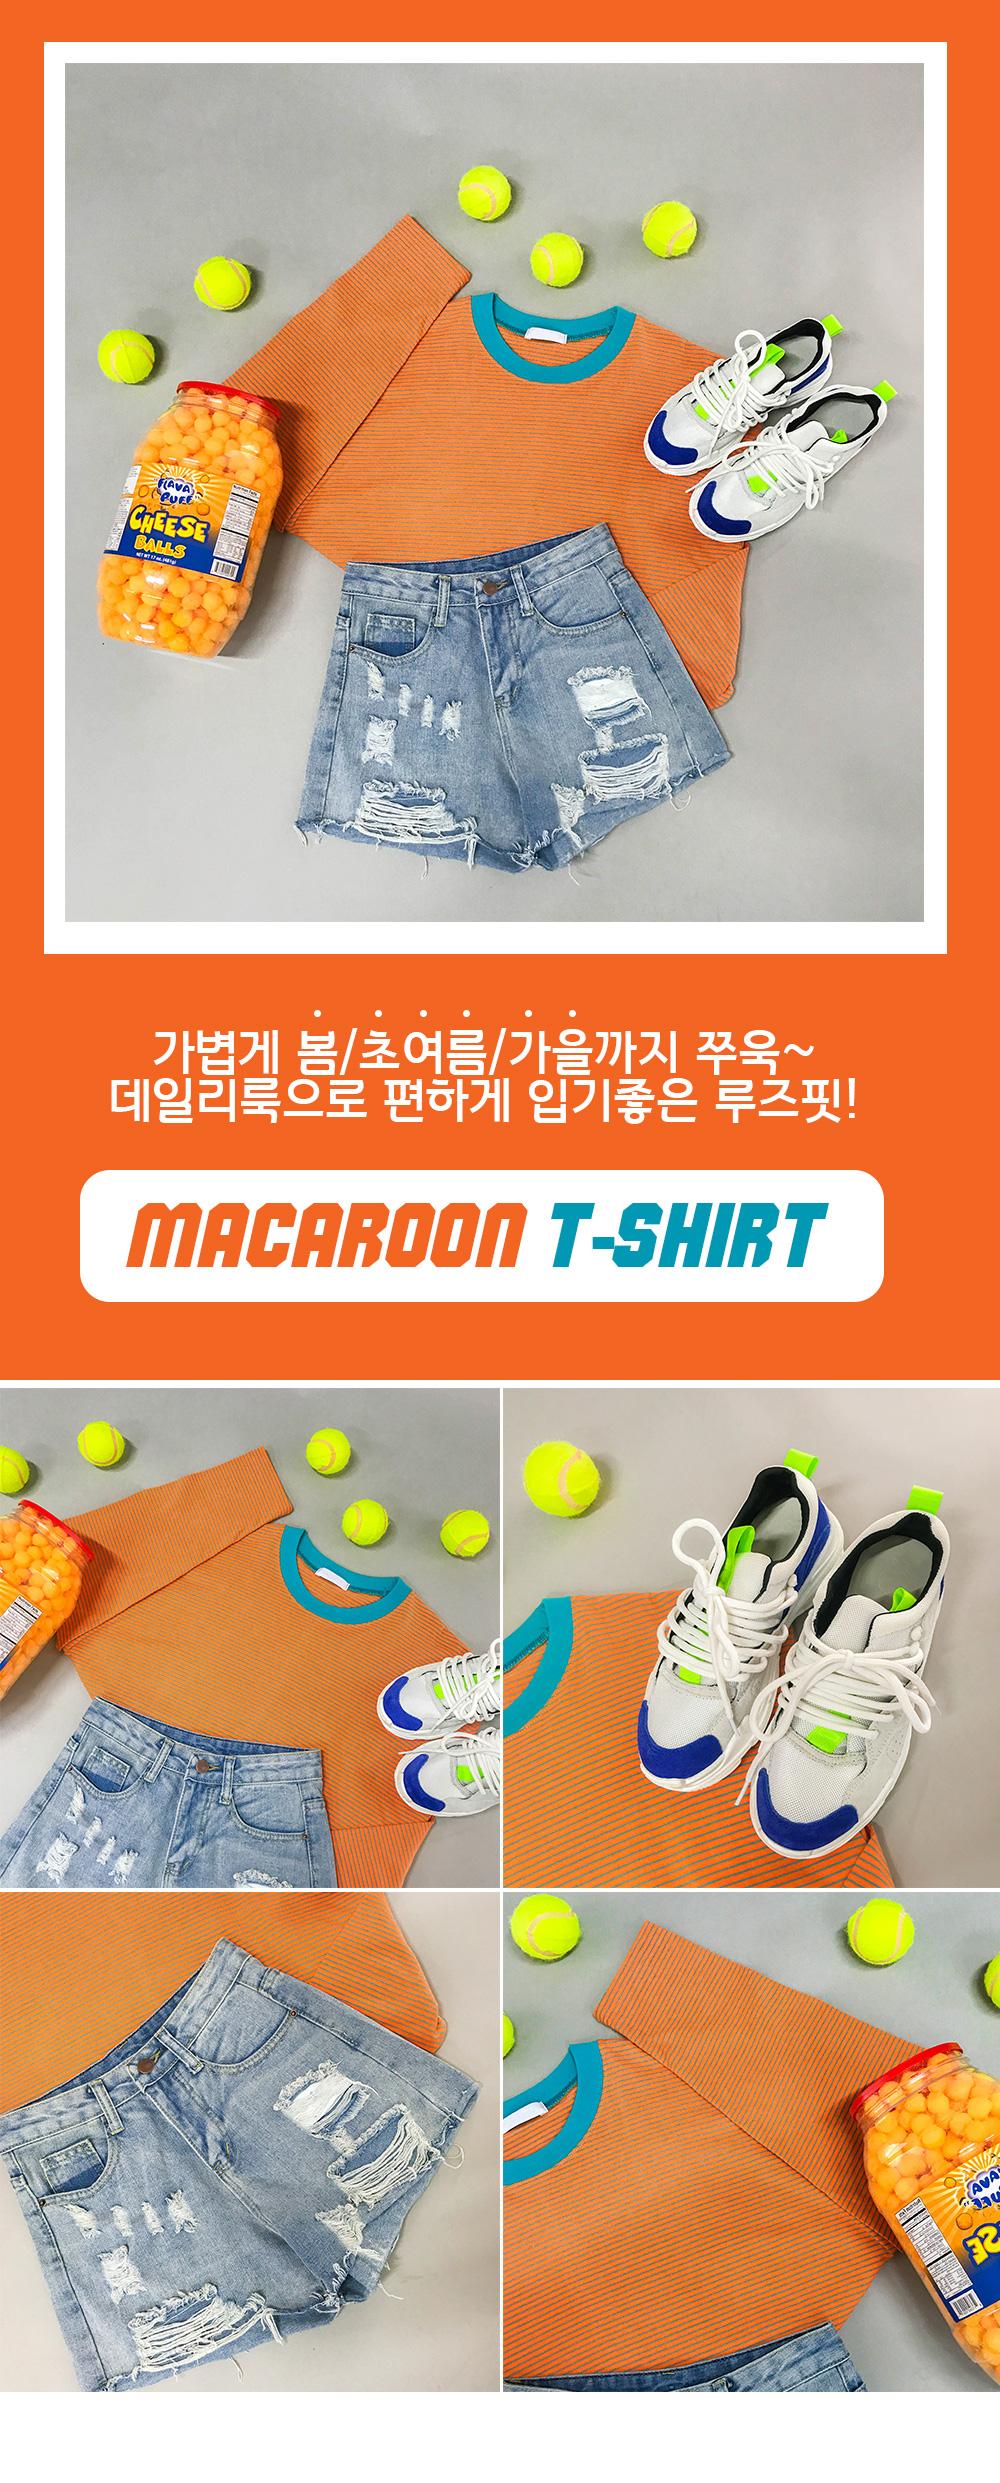 Macaroon Rouge T-shirt